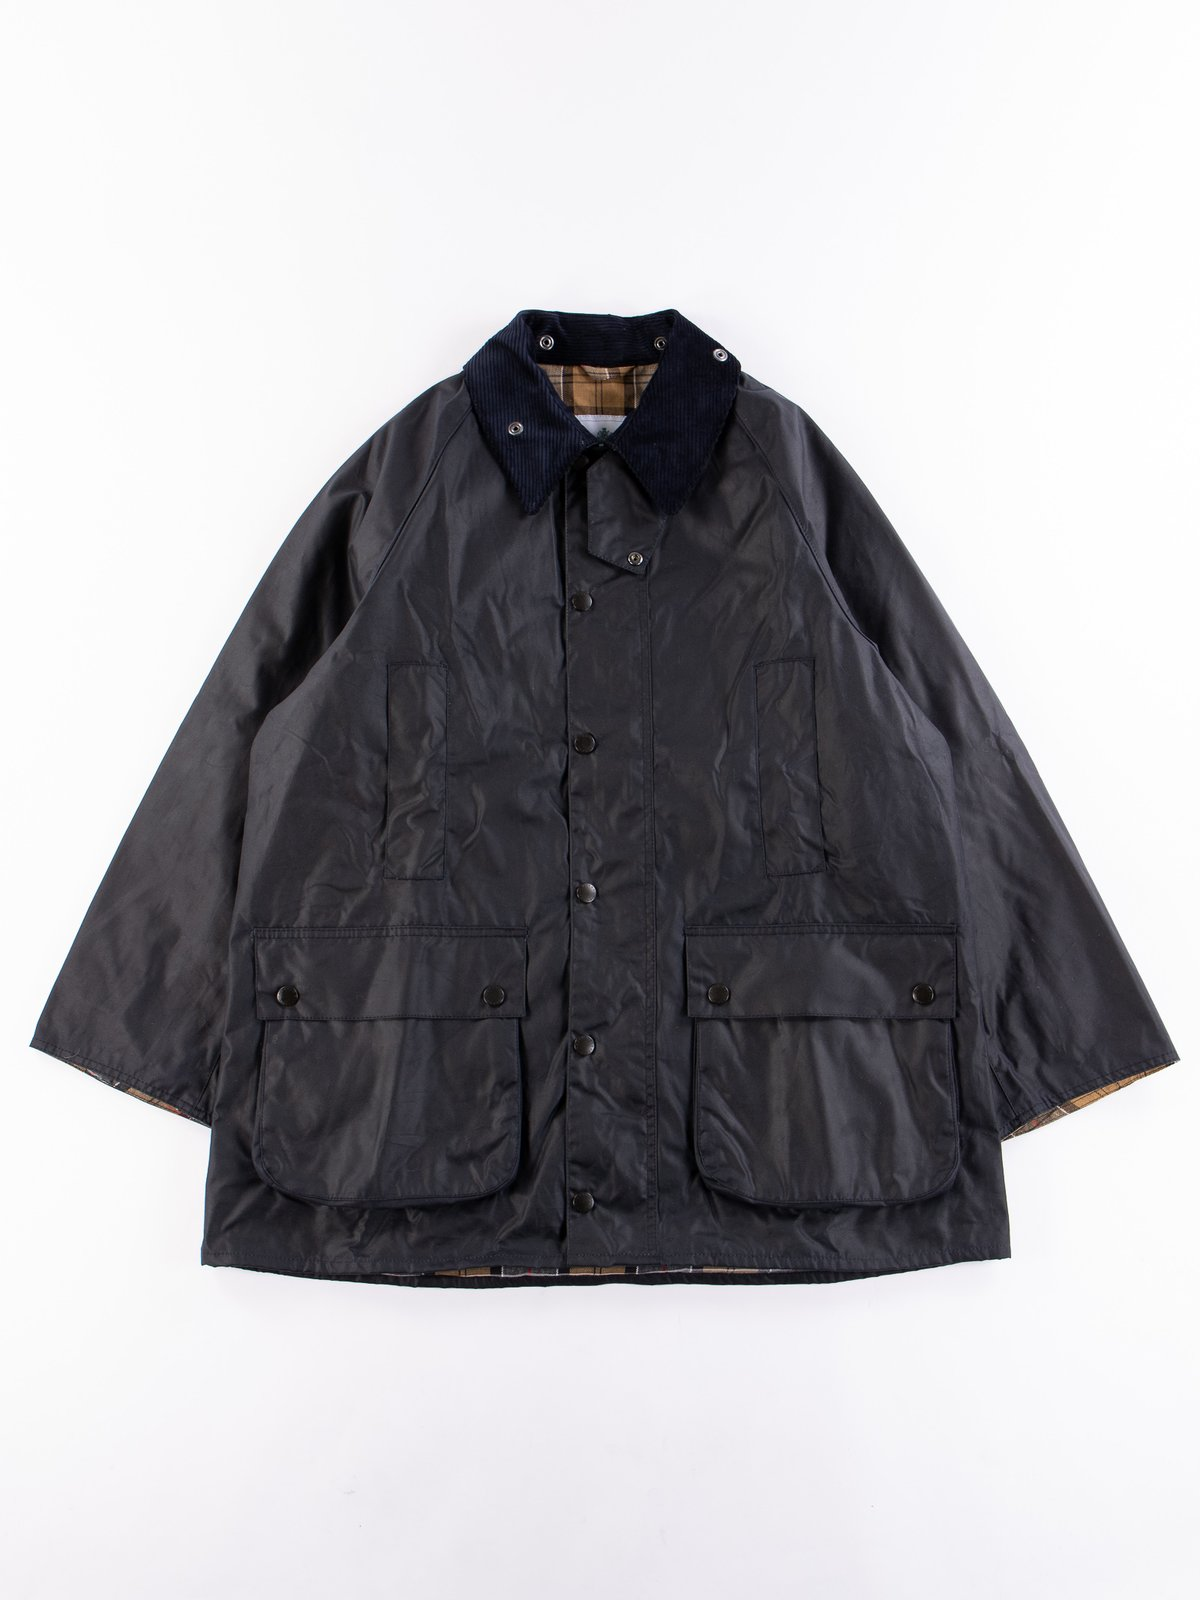 Navy Oversized Beaufort Waxed Cotton Jacket - Image 1